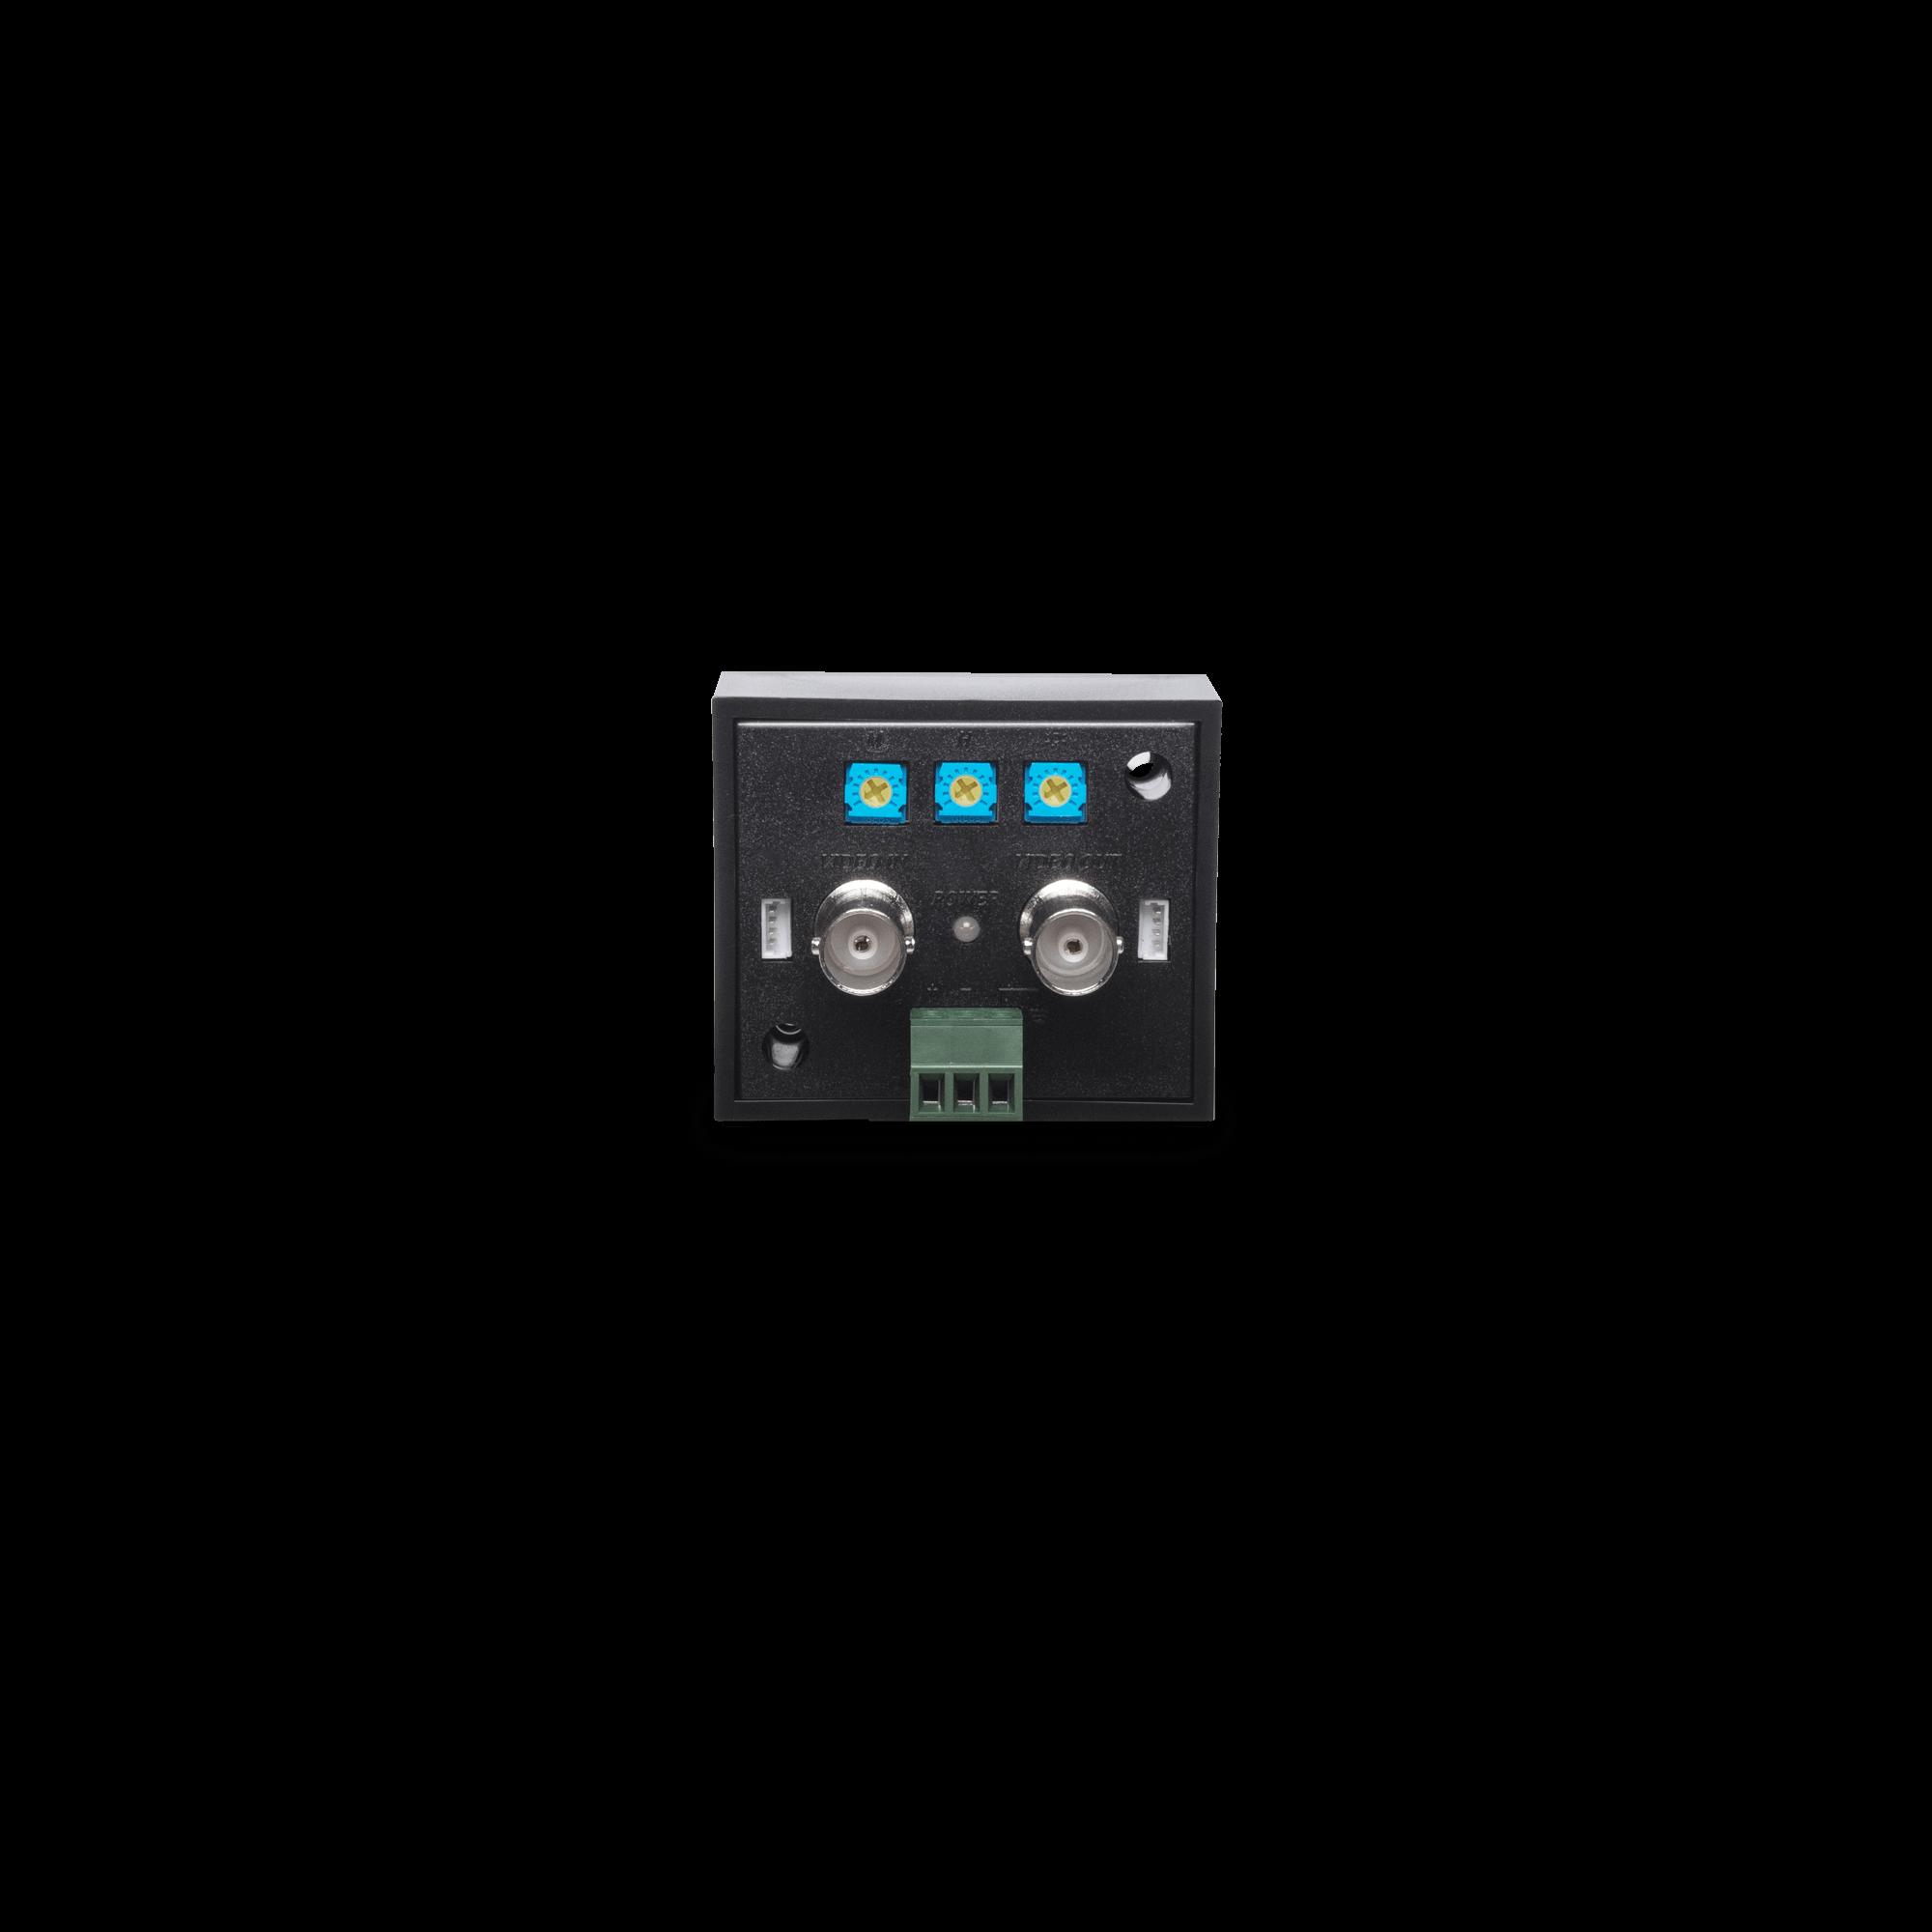 HD-TVI/AHD/HDCVI/CVBS Video Amplifier